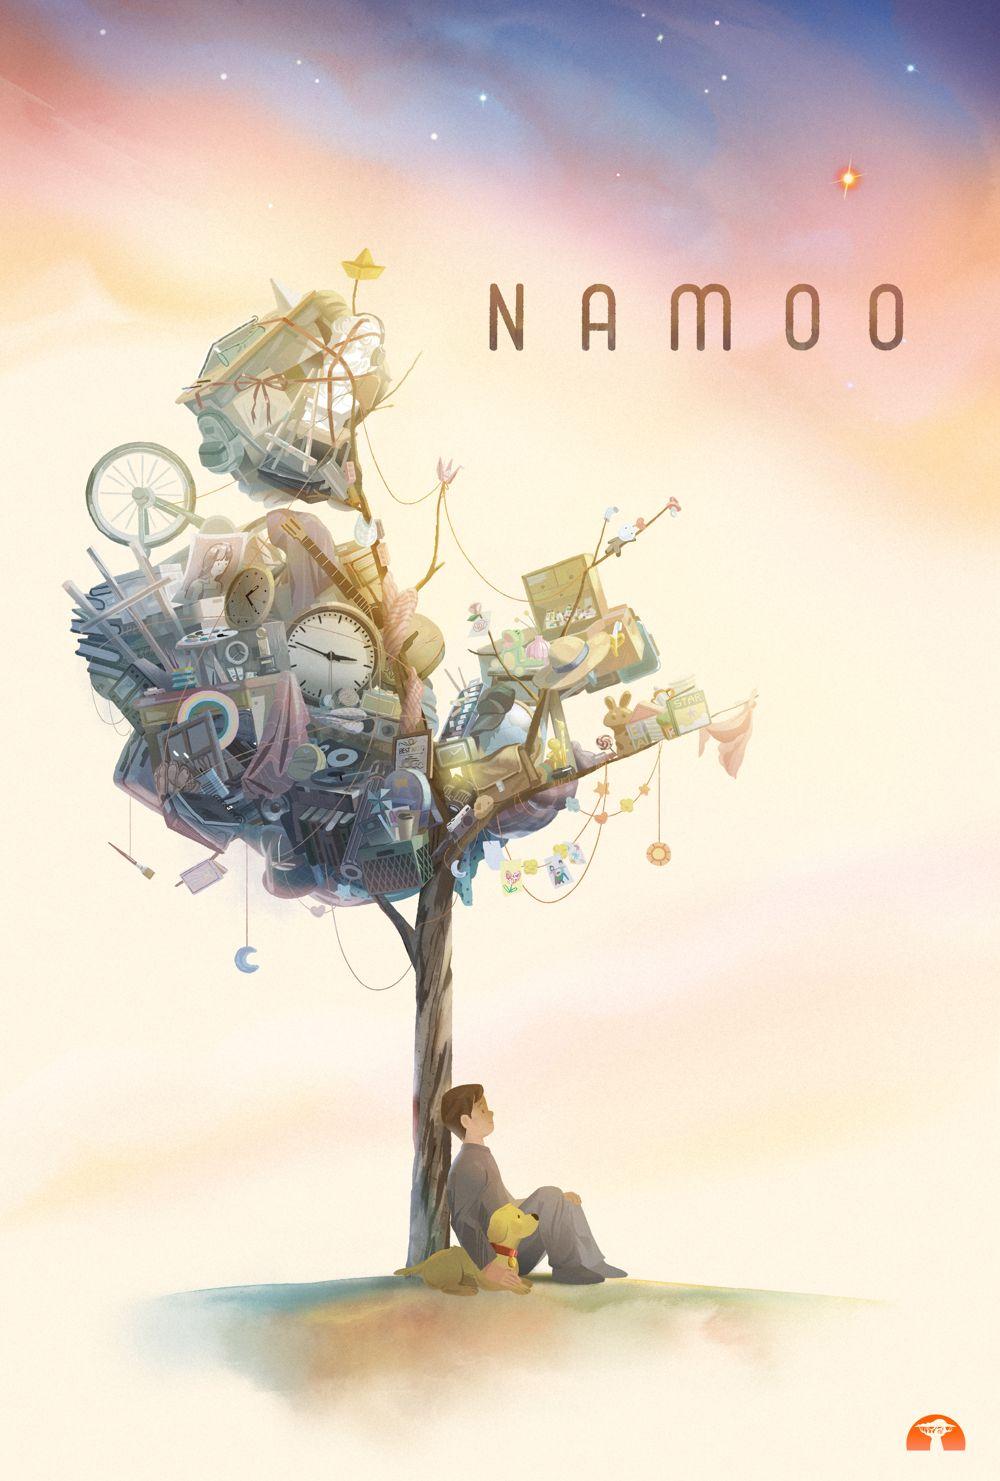 "Namoo ""width ="" 1000 ""height ="" 1481 ""class ="" size-full wp-image-280077 ""srcset ="" https://www.cartonionline.com/wordpress/wp-content/uploads/2021/01/Baobab-prende-in-giro-quotNamooquot-di-Erick-Oh-per-celebrare-la-prima-del-Sundance.jpg 1000w, https://www.animationmagazine.net/wordpress/wp-content/uploads/Namoo2-1-162x240.jpg 162w, https://www.animationmagazine.net/wordpress/wp-content/uploads/Namoo2-1 -675x1000.jpg 675w, https://www.animationmagazine.net/wordpress/wp-content/uploads/Namoo2-1-768x1137.jpg 768w ""izes = ""(larghezza massima: 1000px) 100vw, 1000px"" />  <p class="